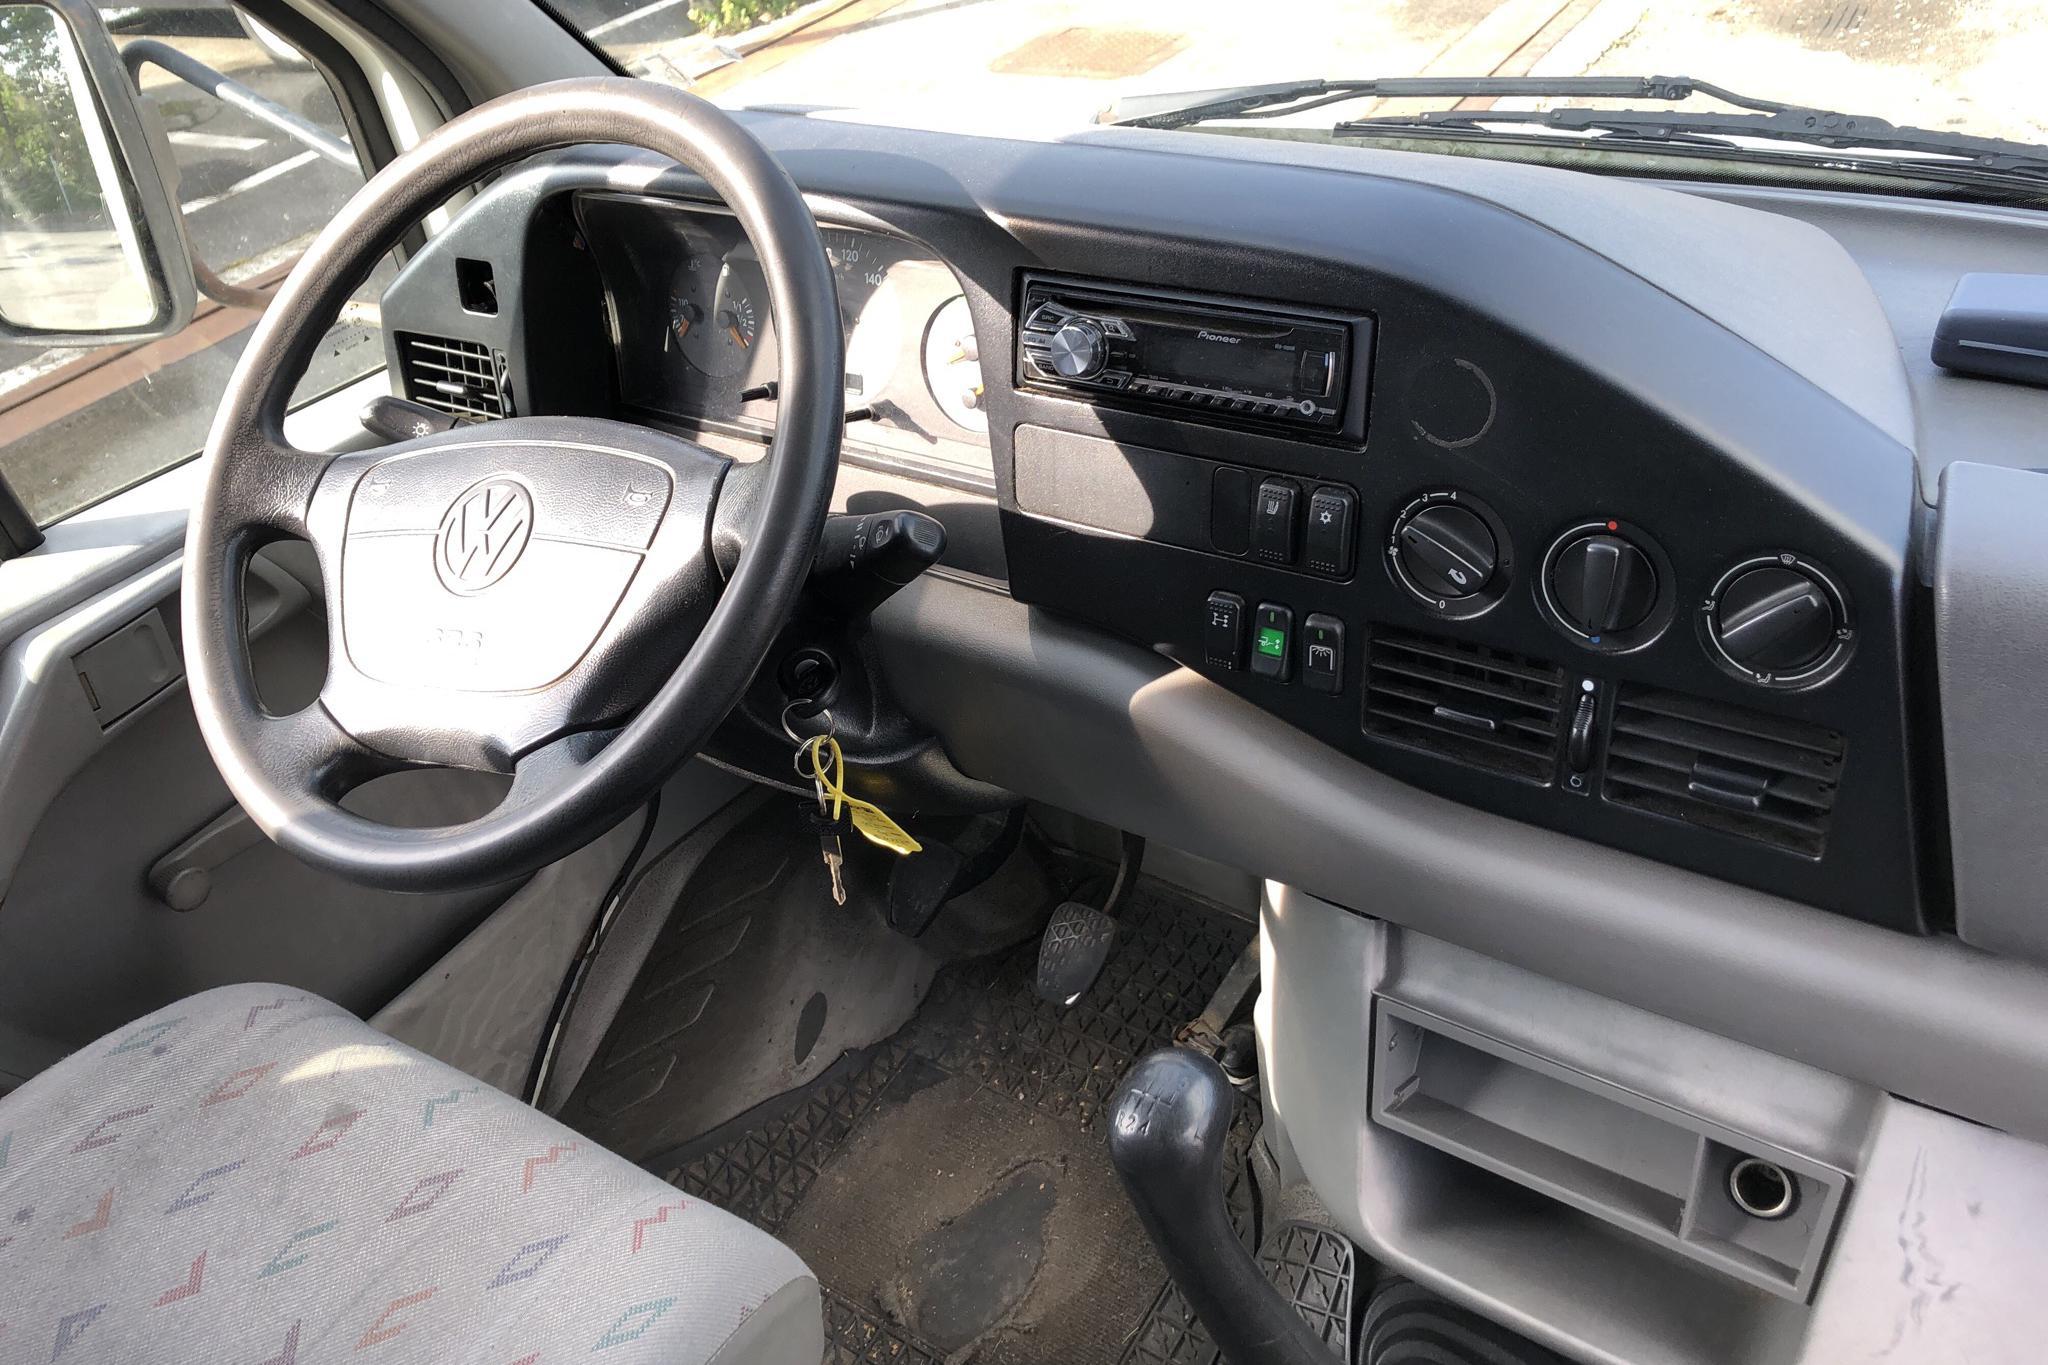 VW LT 35 Volymskåp - 21 005 mil - Manuell - vit - 1999